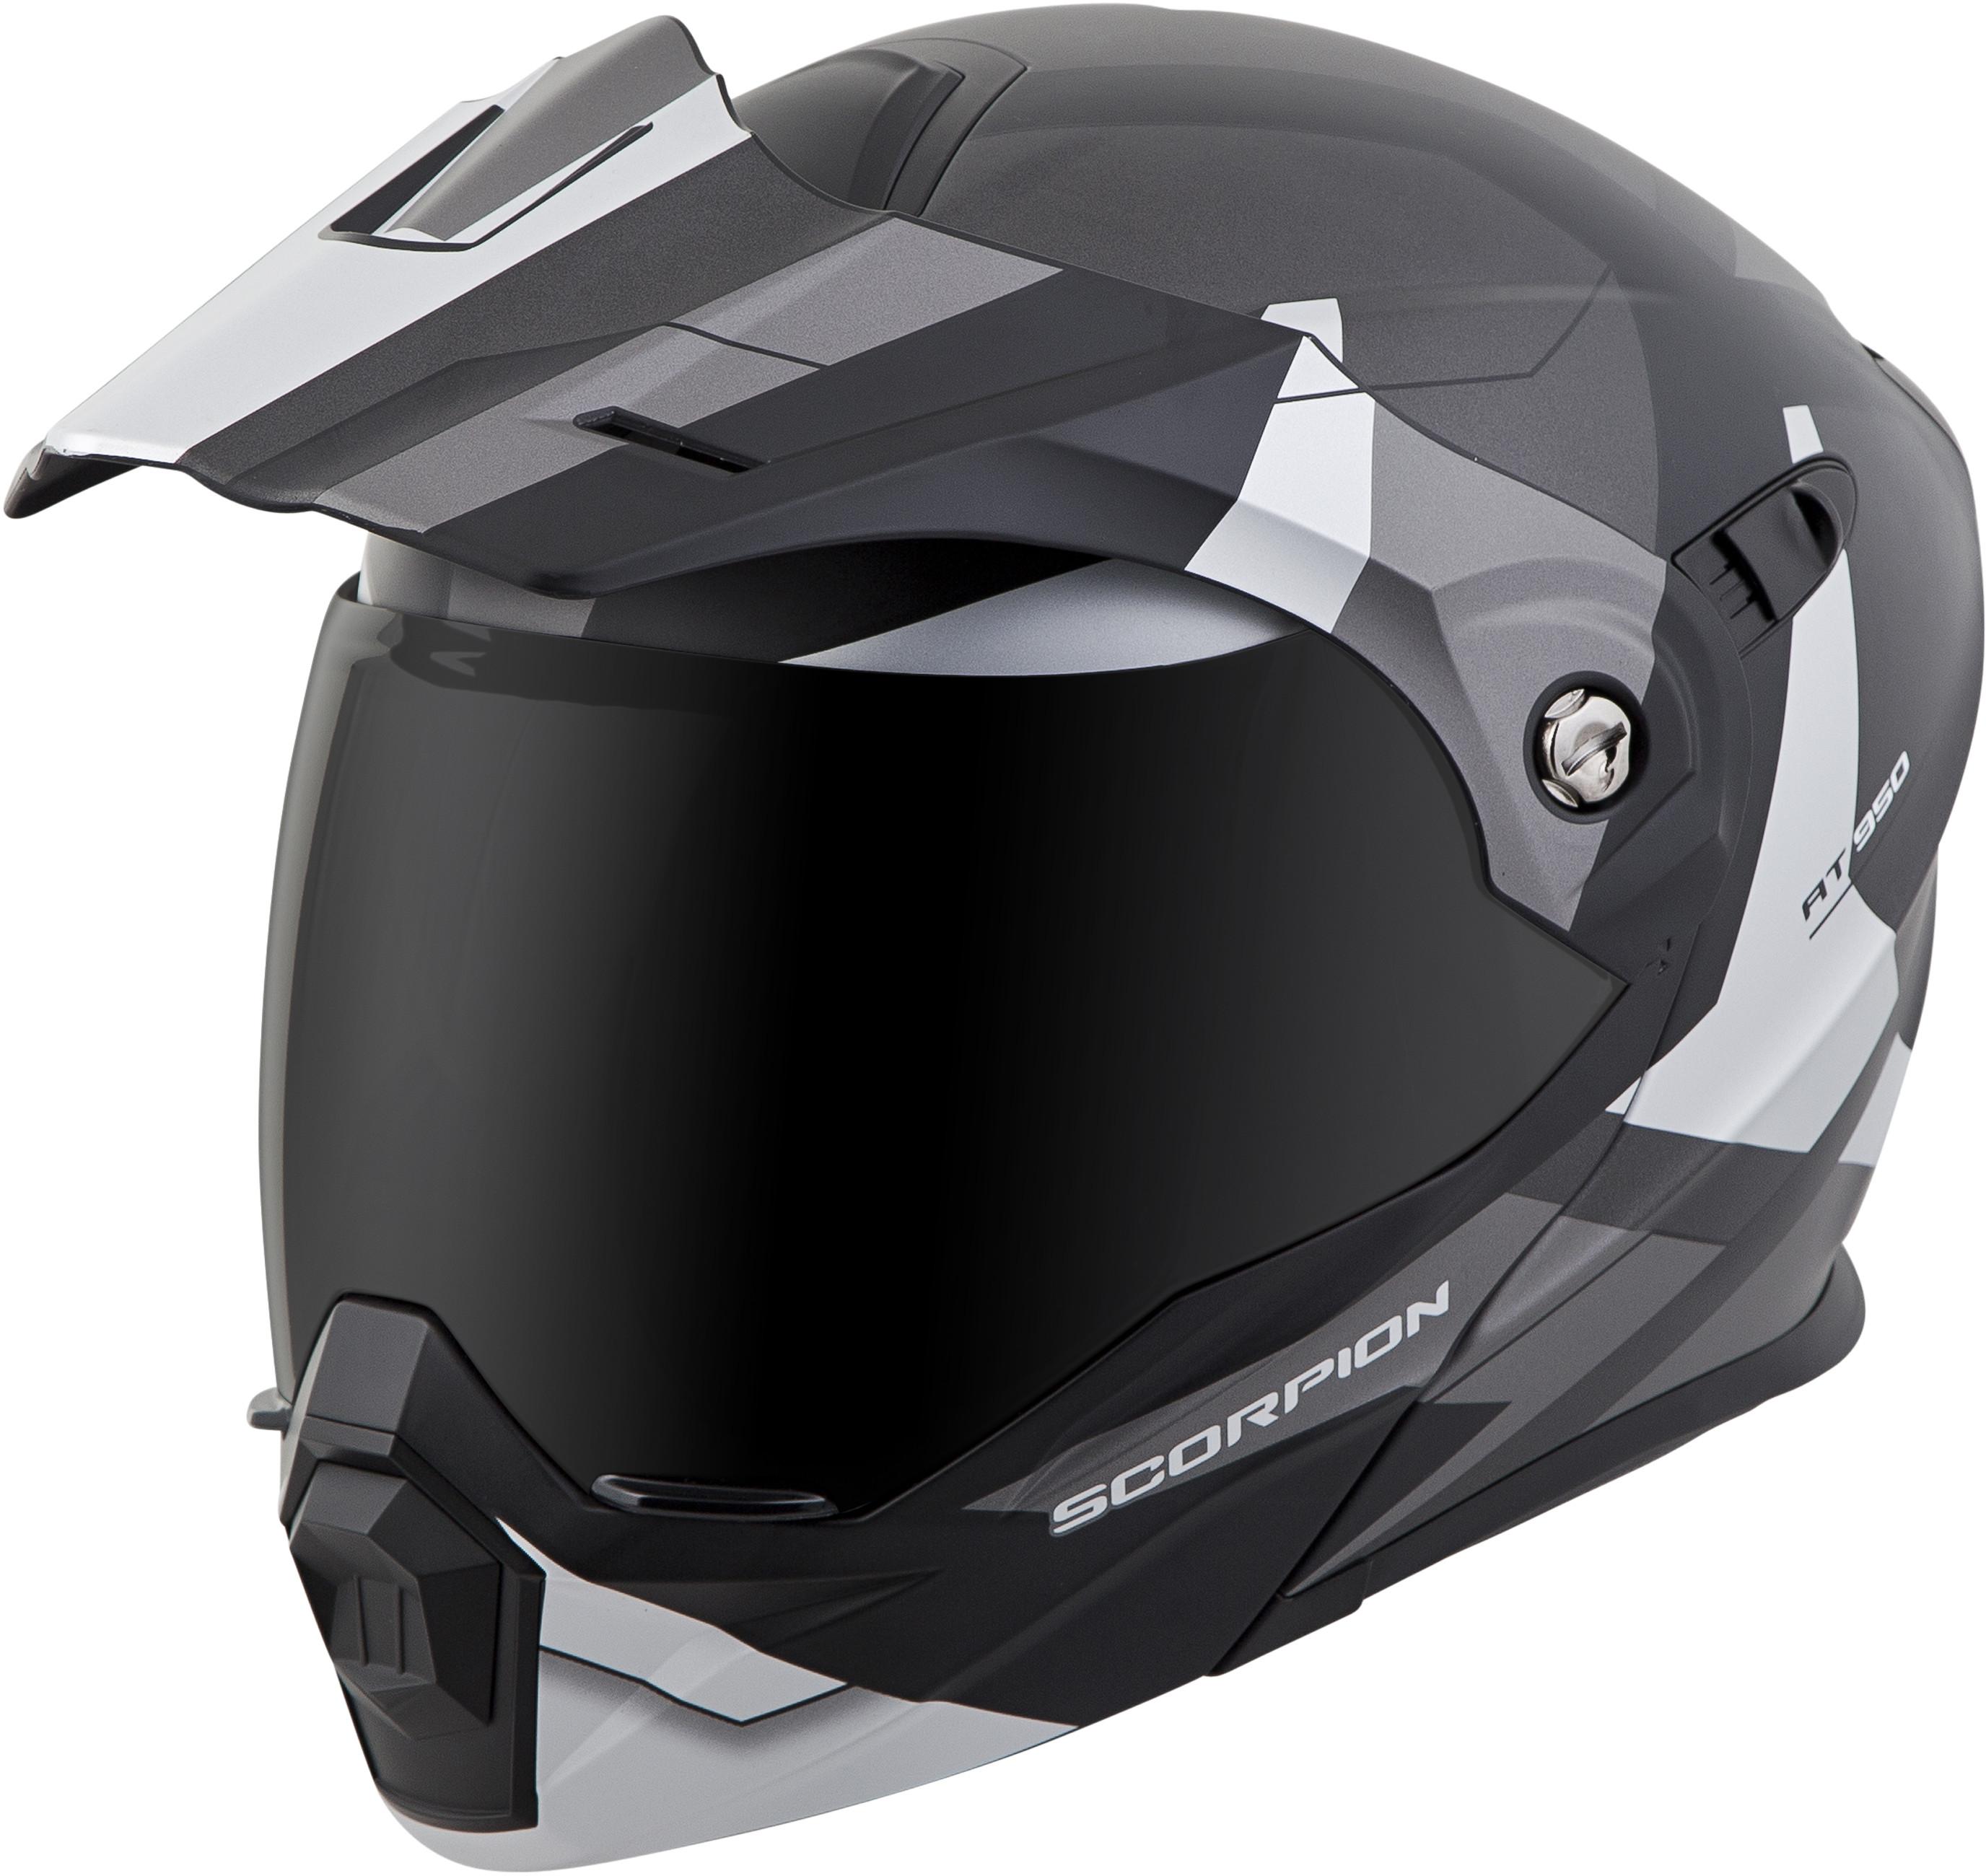 for-Scorpion-Helmet-EXO-AT950-Neocon-Snow-Helmet-with-Dual-Lens-Shield miniature 25